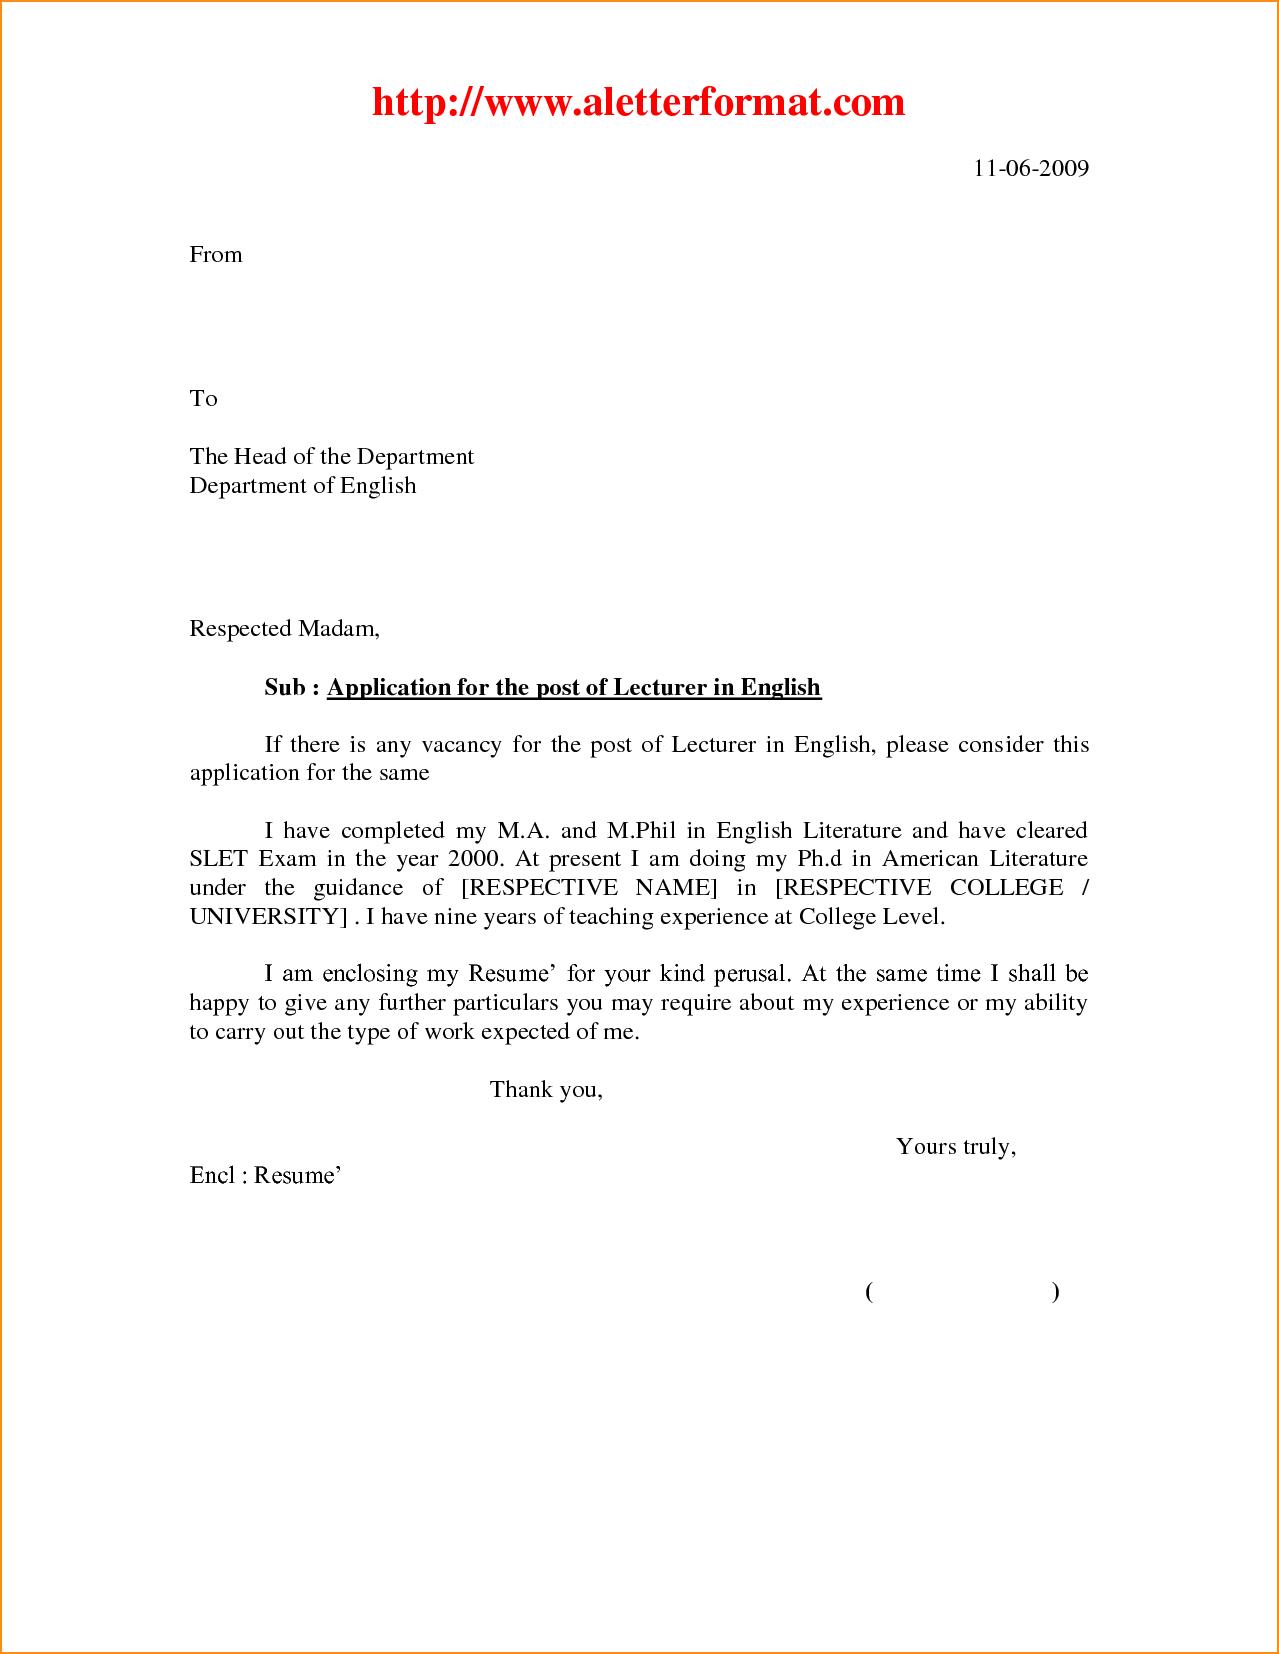 contoh application letter fresh graduate yang bagus surat lamaran kerja bahasa inggris berbagai posisi berita unik - Resume Letter Fresh Graduate